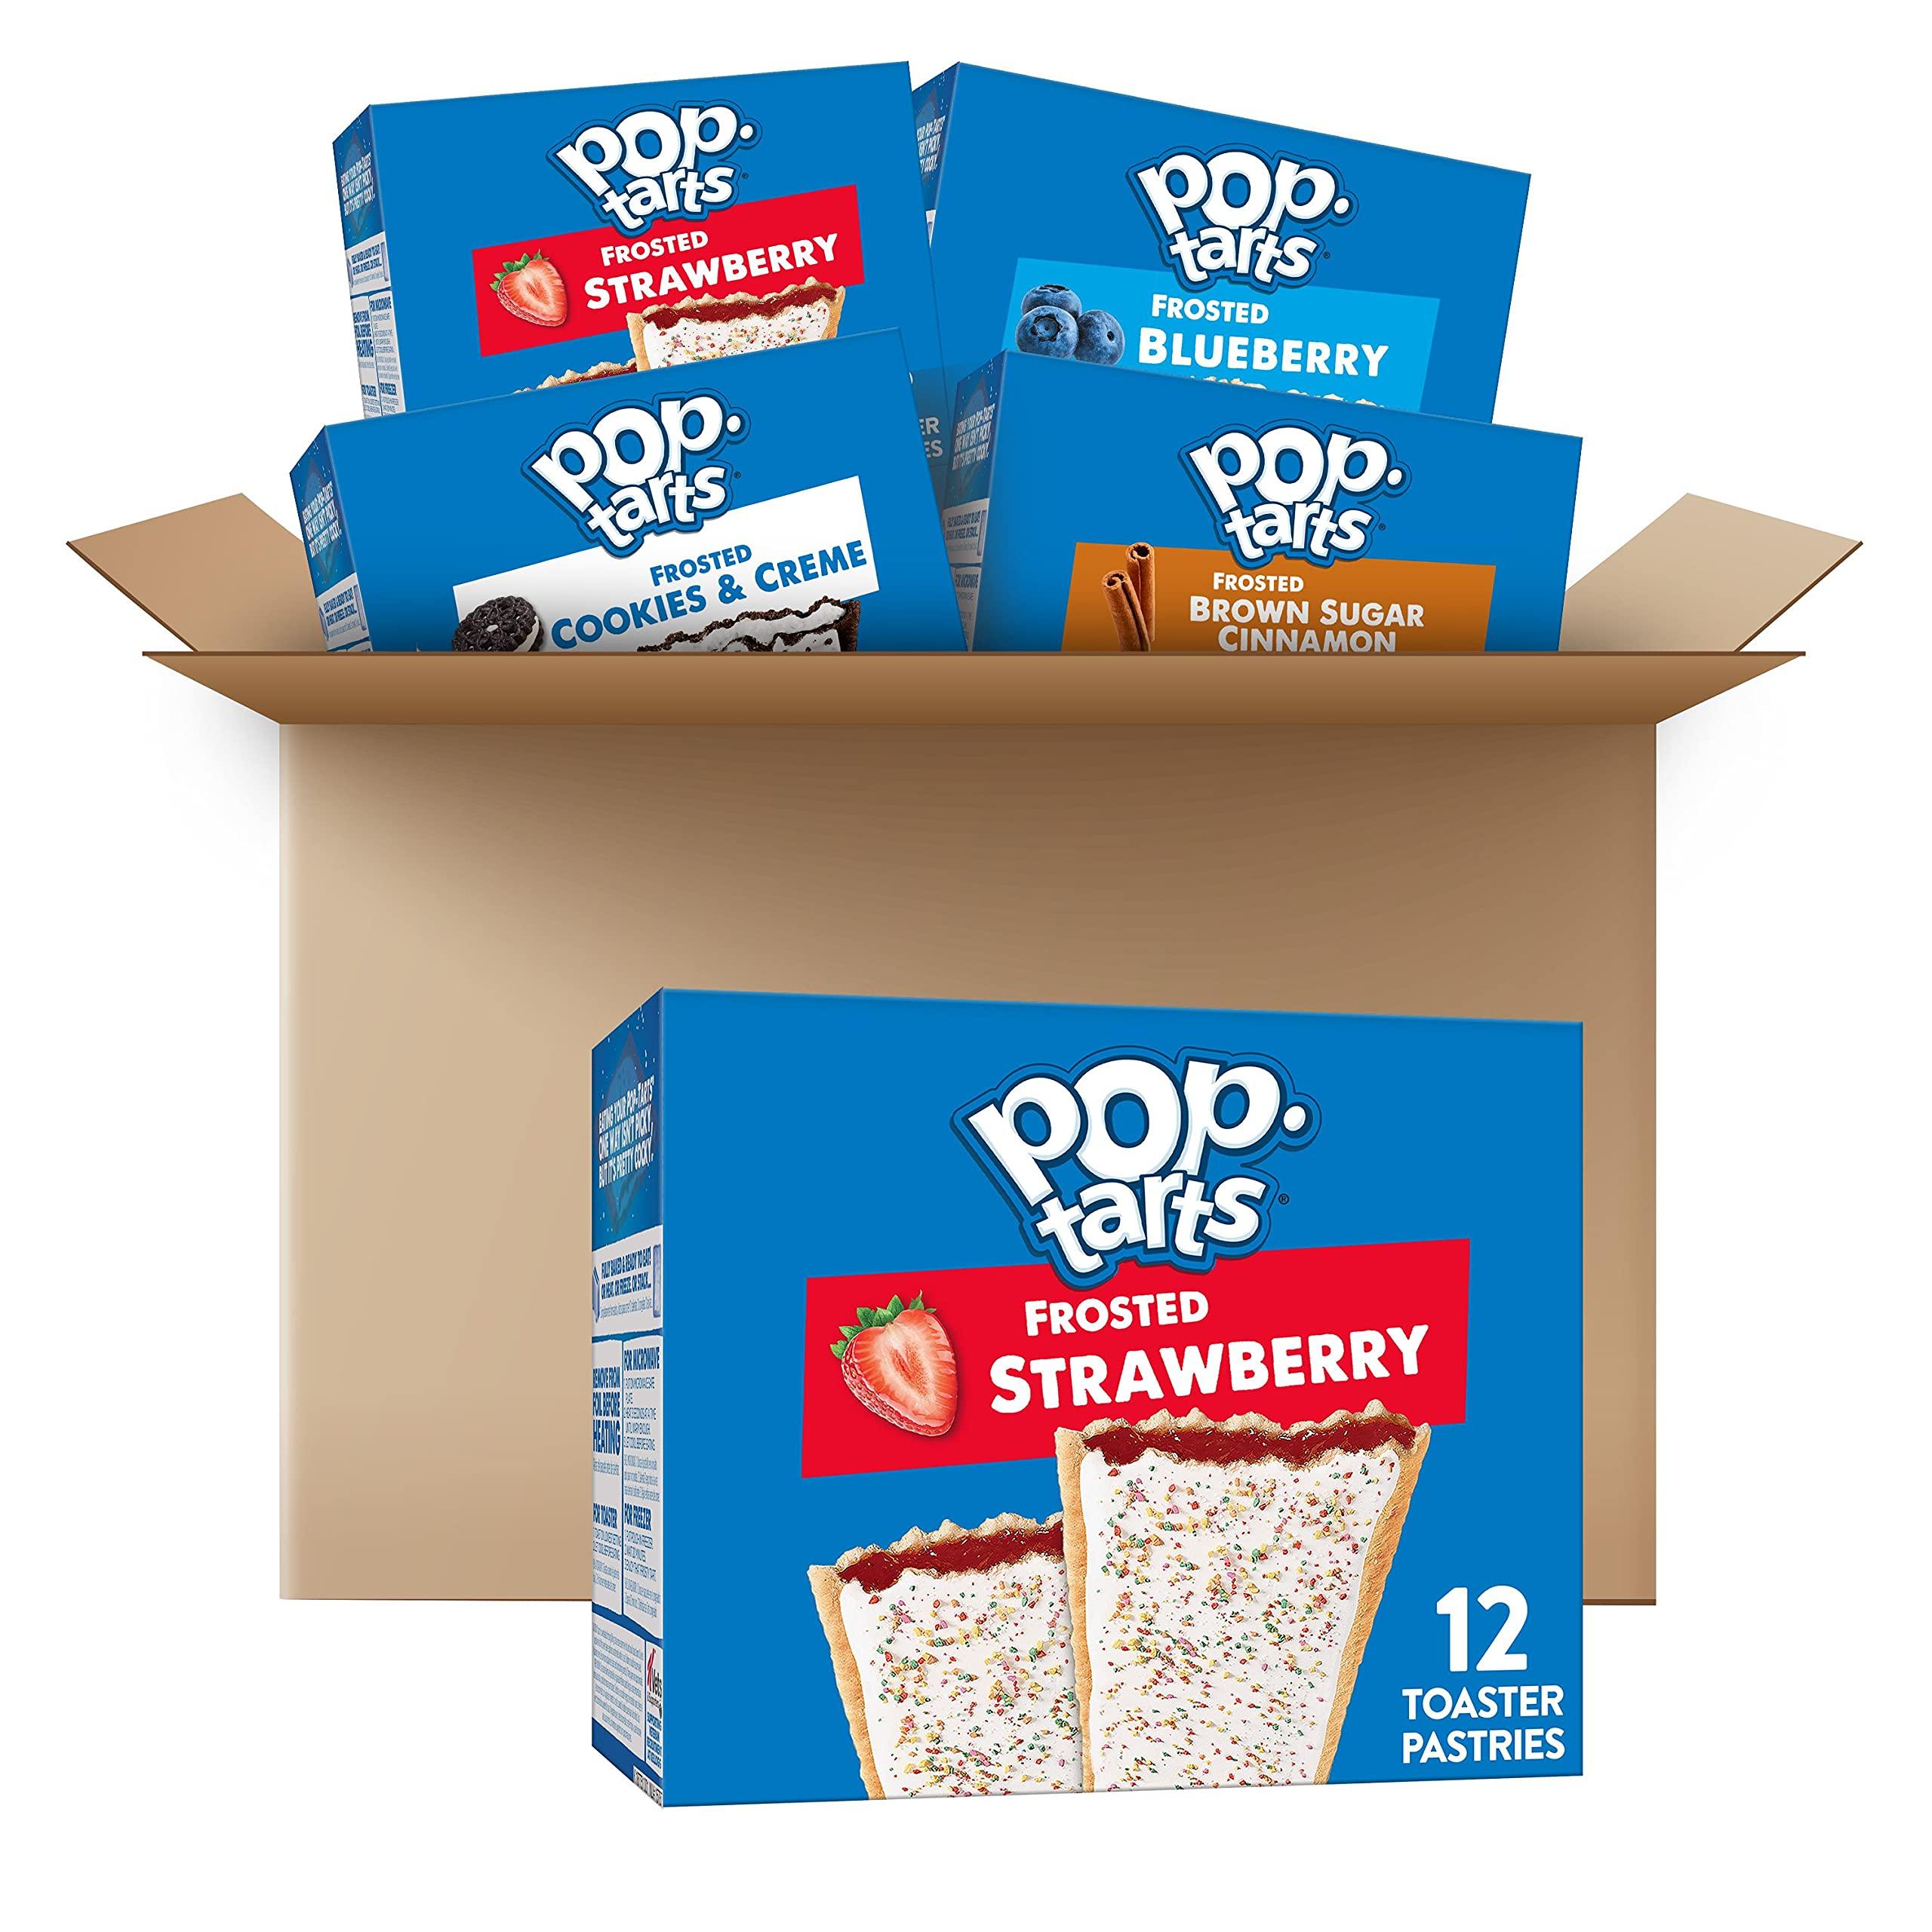 Pop-Tarts Toaster Pastries, 5 Flavor Variety Pack, Breakfast Foods, Fun Snacks for Kids, 5 Boxes (60 Pop-Tarts)